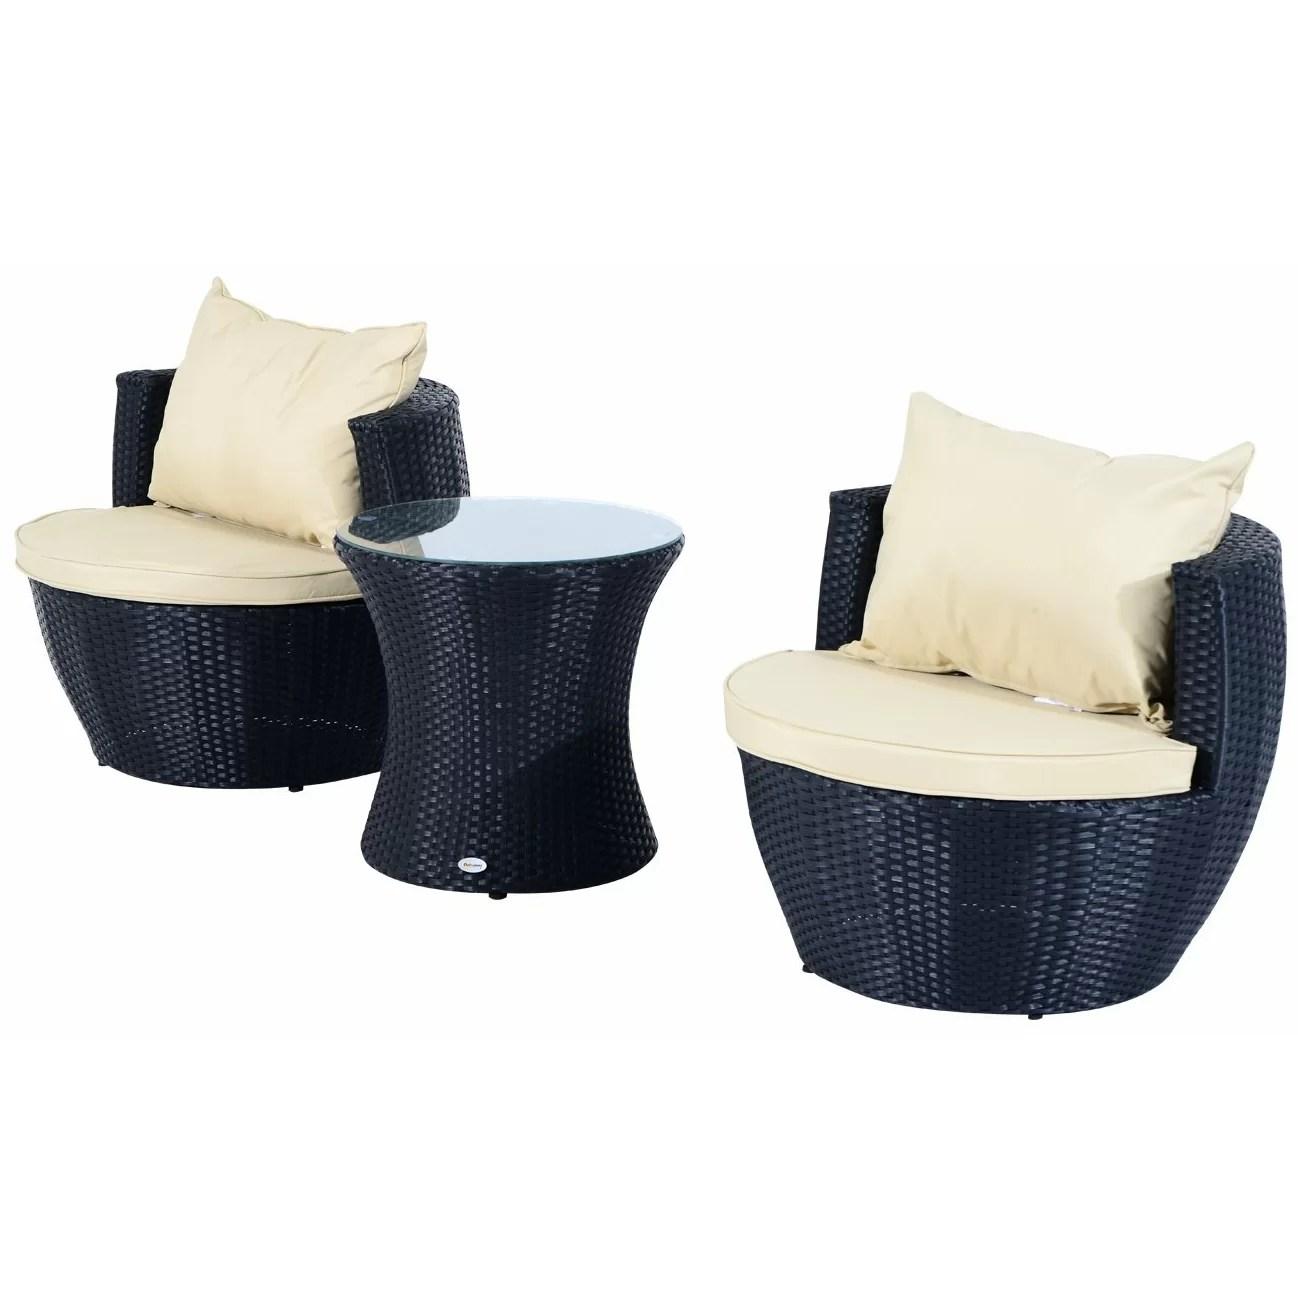 Bedroom Sofa Chair Under 100 Modern Design Sofas